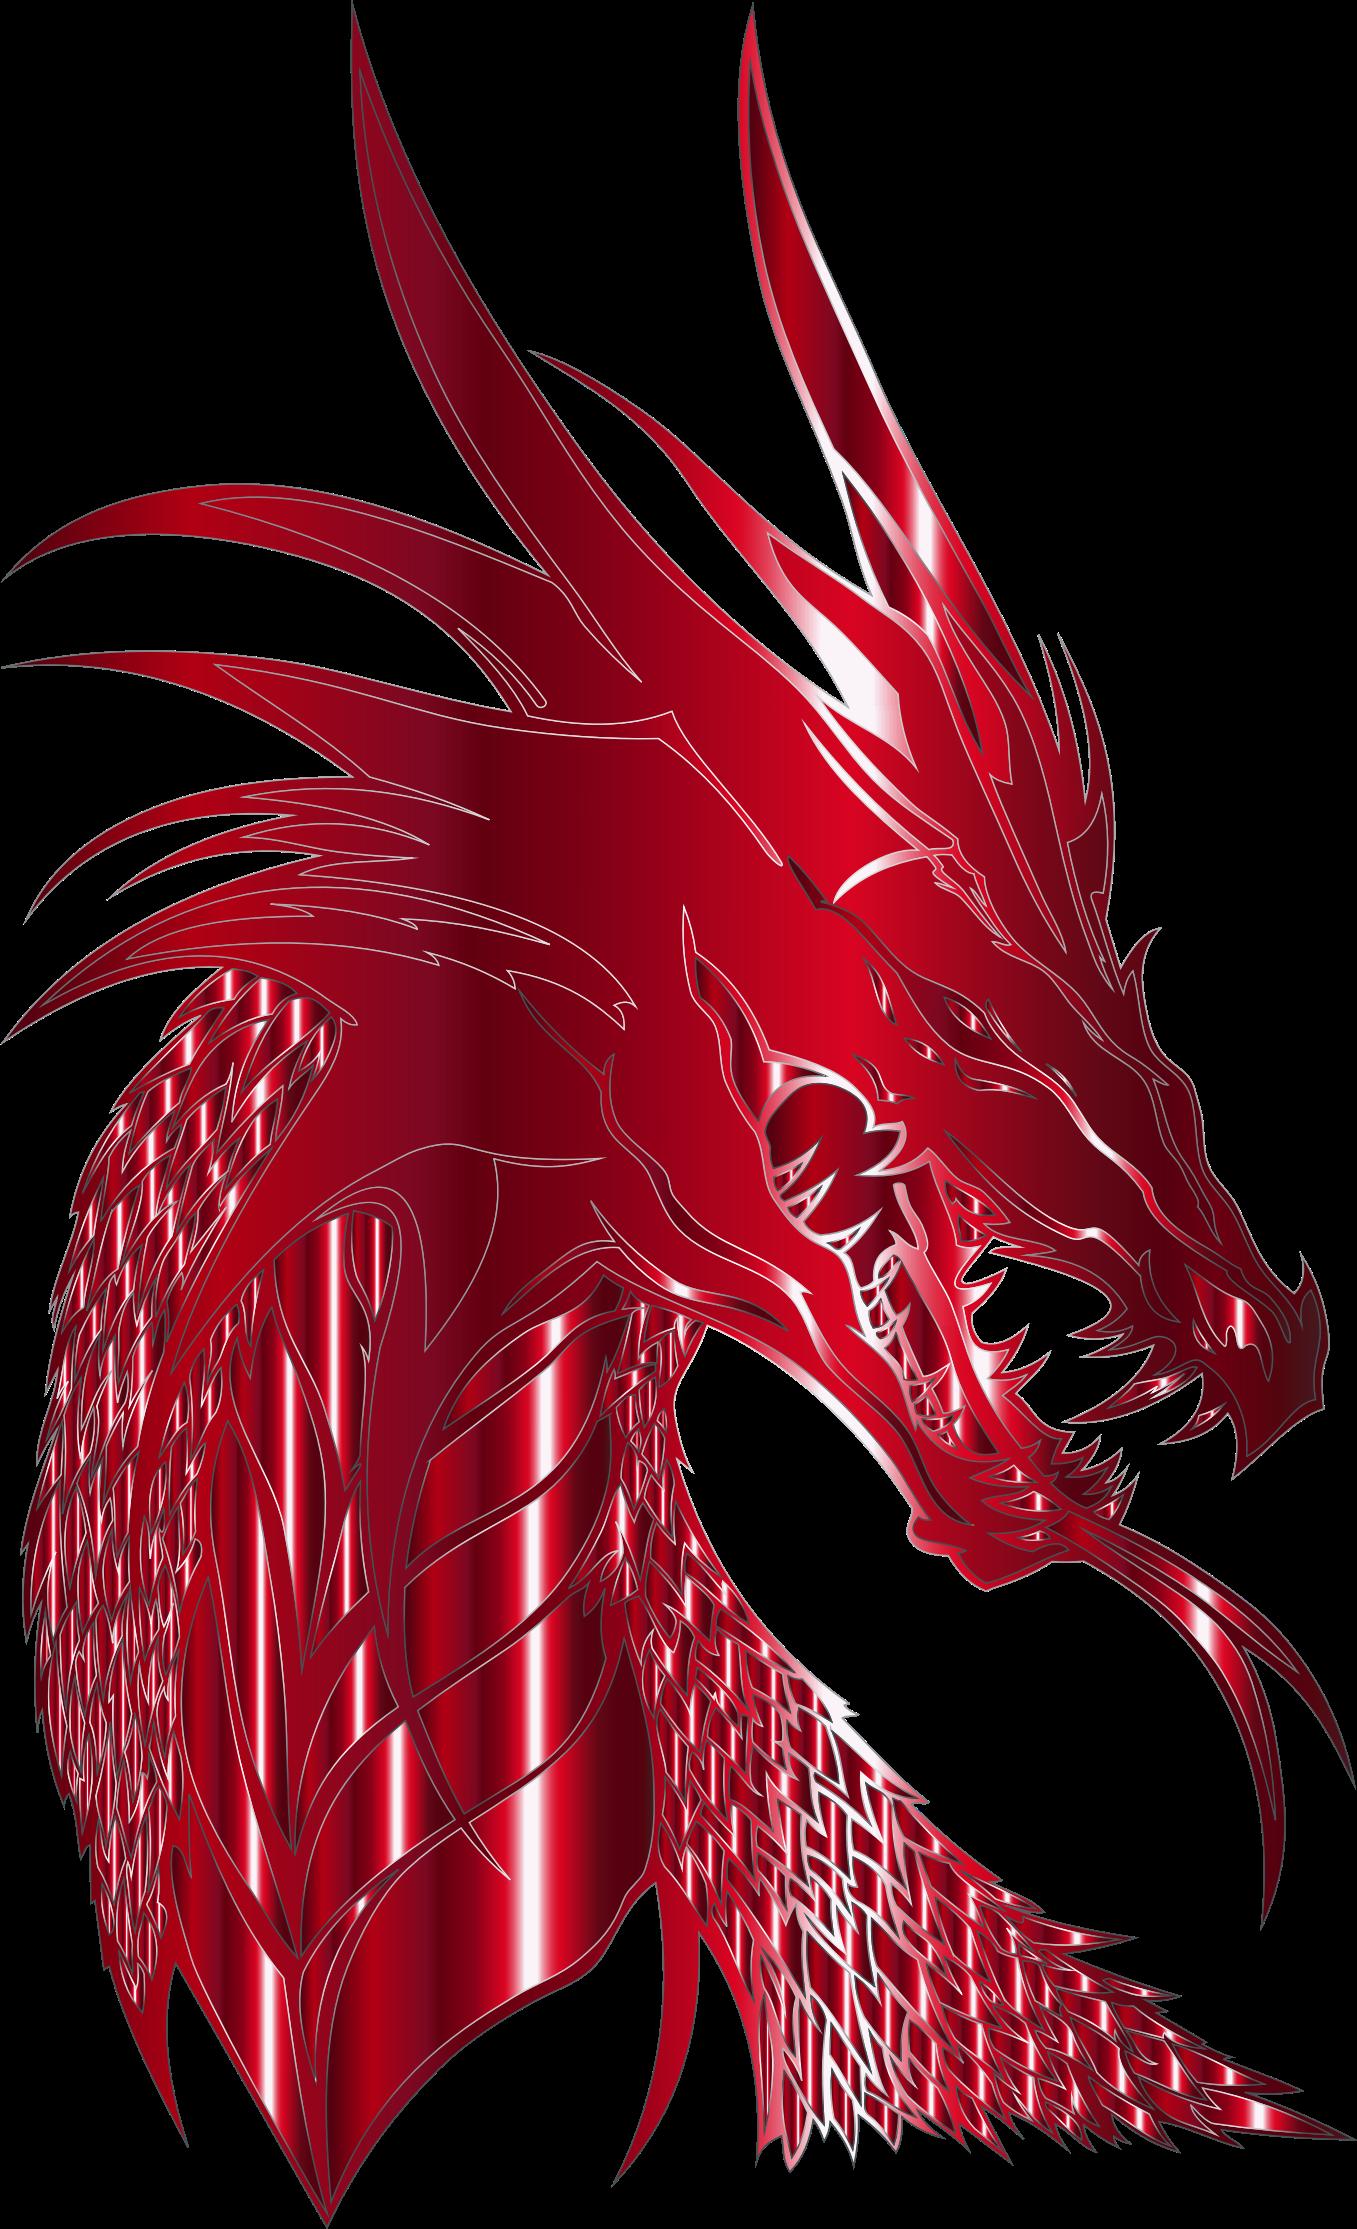 Crimson big image png. Clipart dragon dragon head